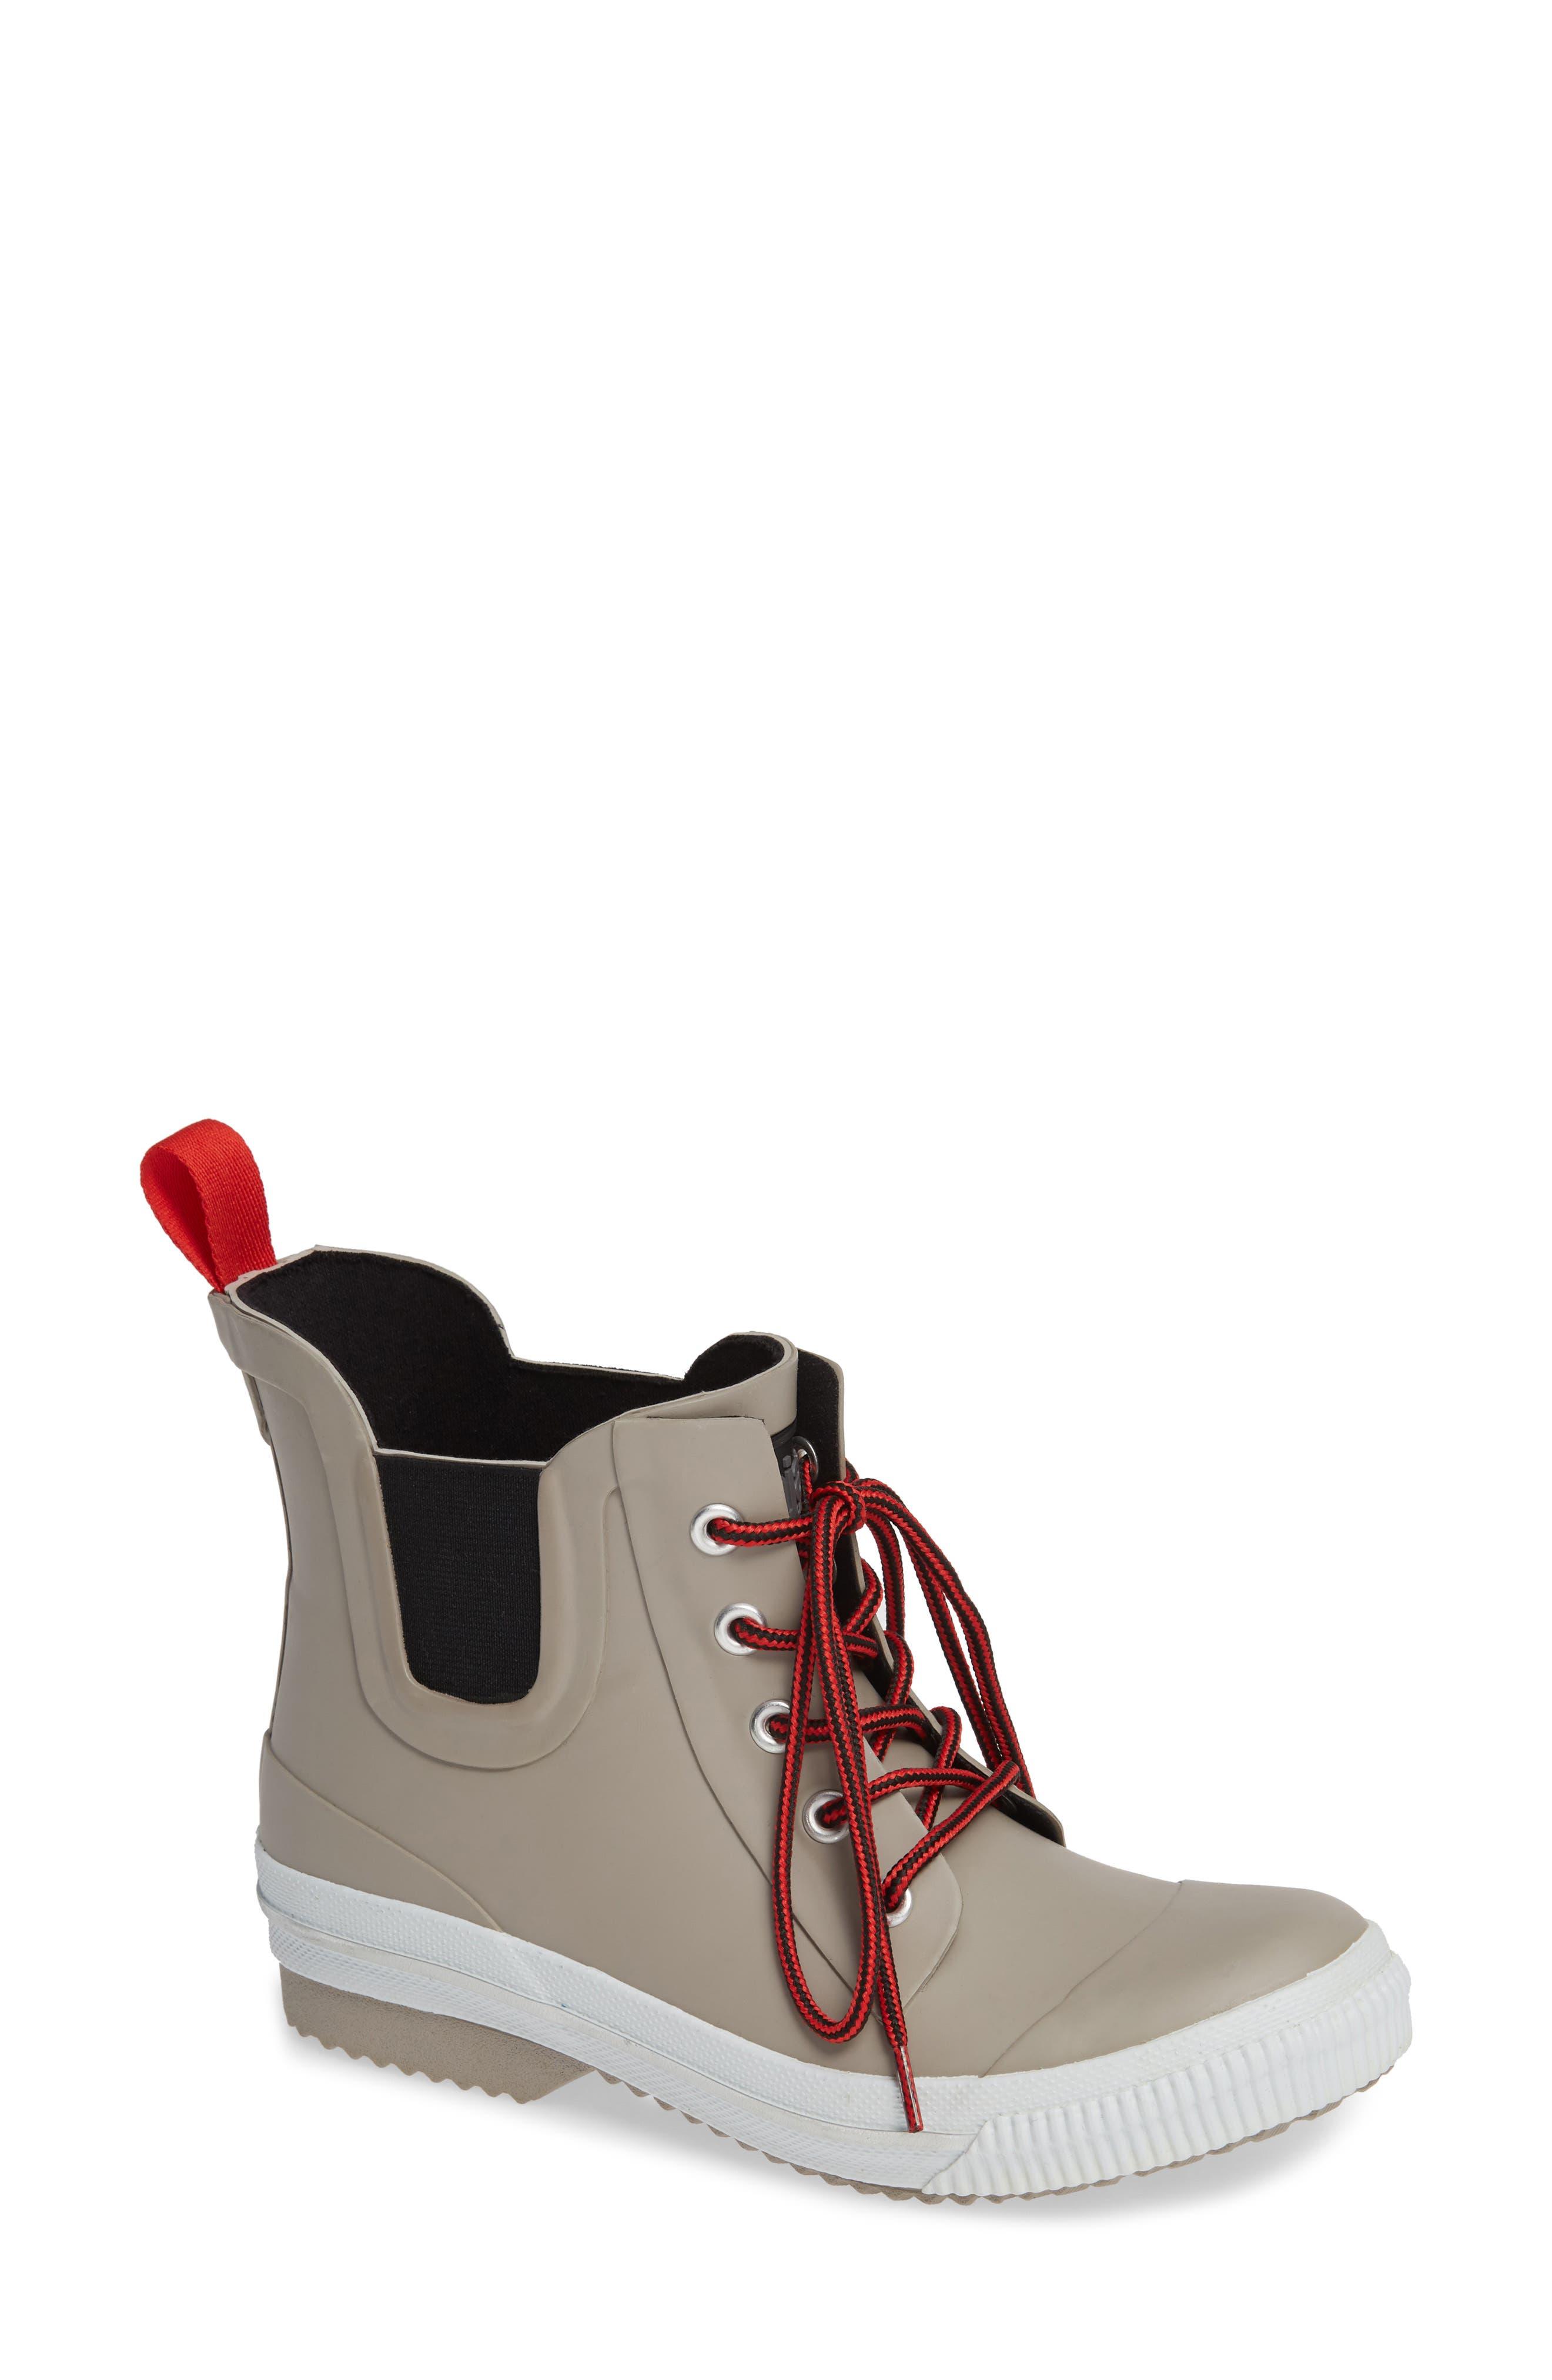 PAJAR Lolita Waterproof Chelsea Waterproof Rain Boot in Grey